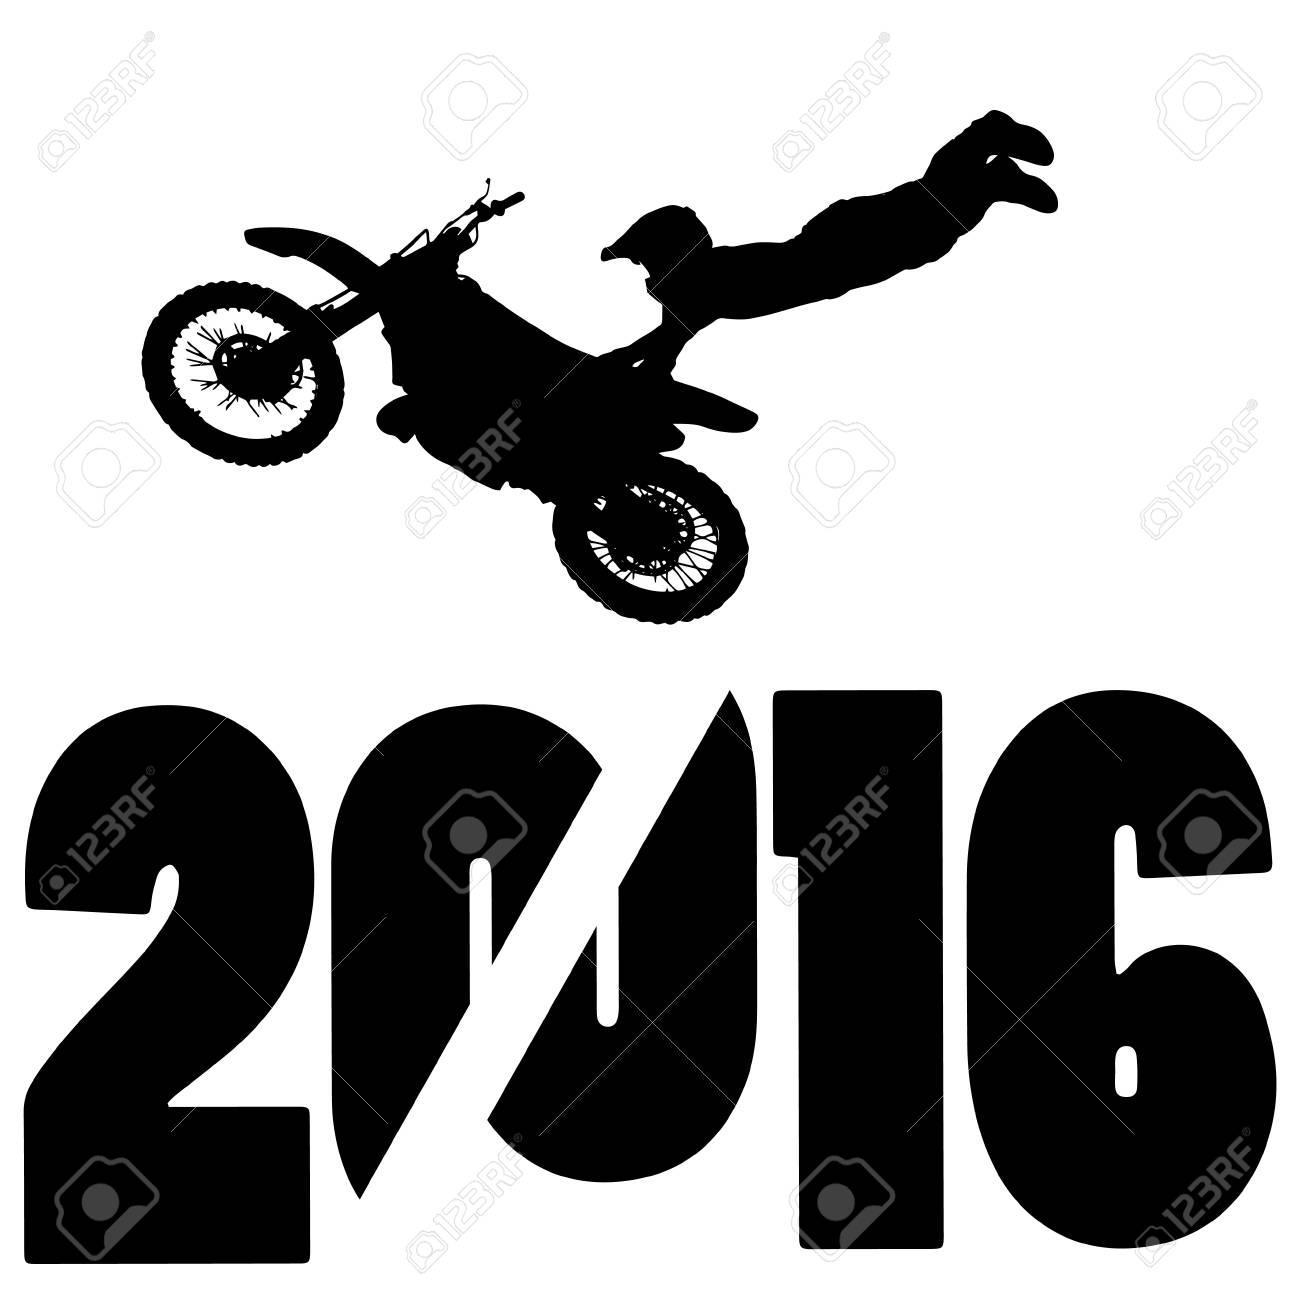 black silhouette vector illustration 2016 New Year - 46233293